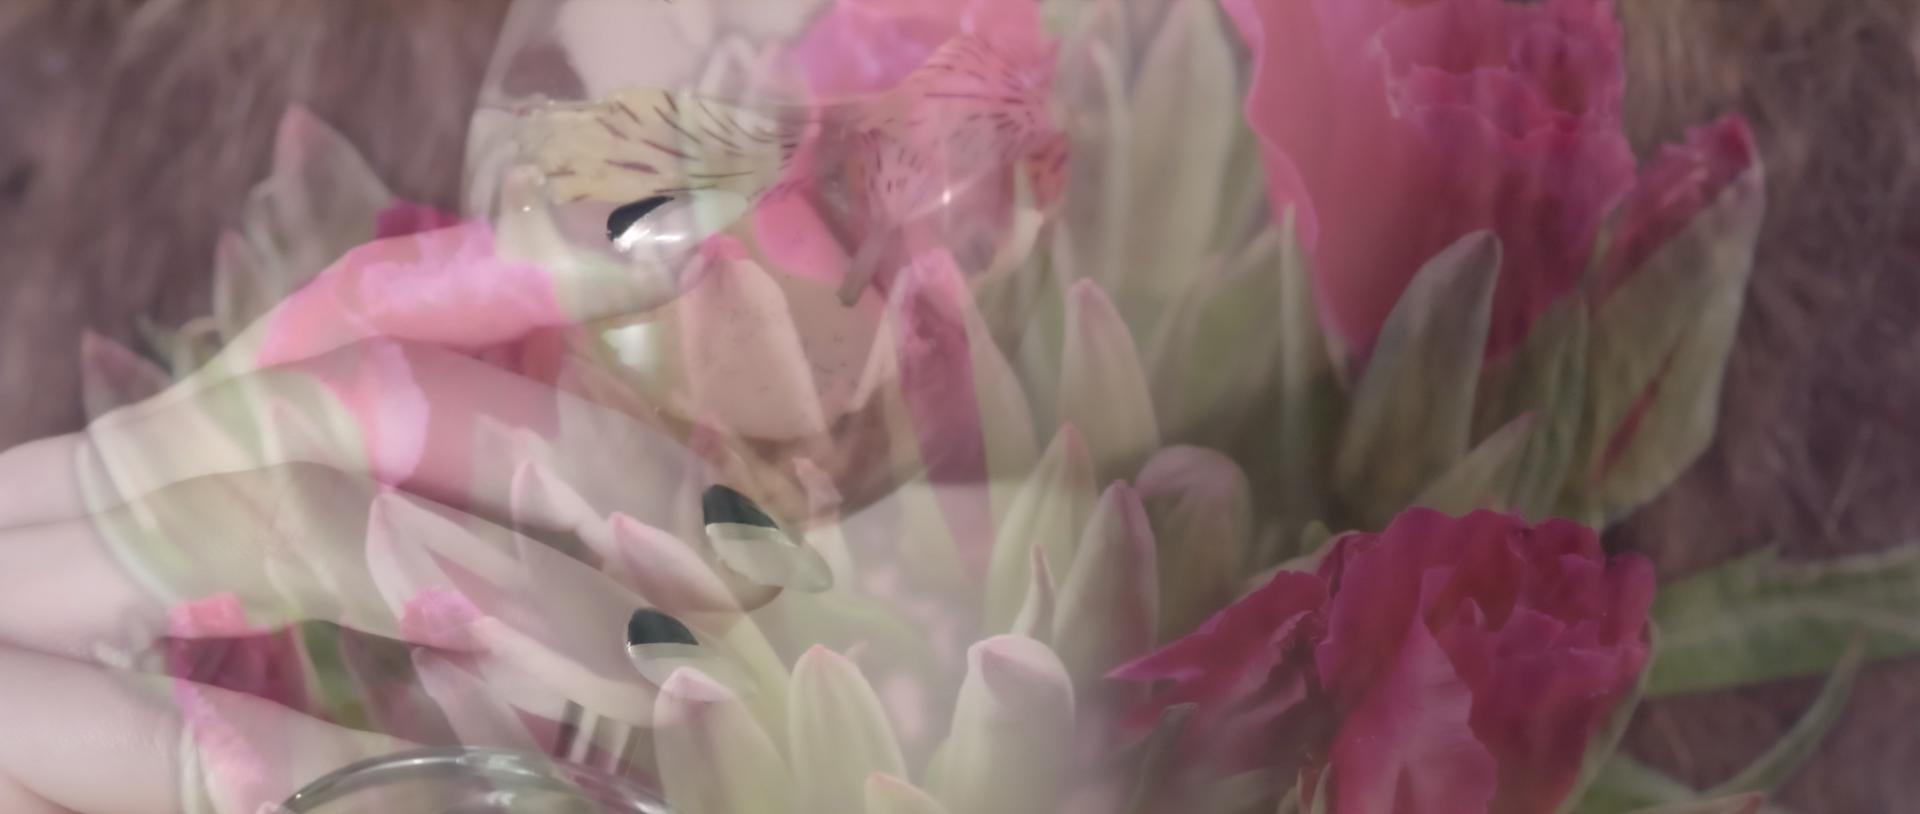 hand floral overlay.jpg